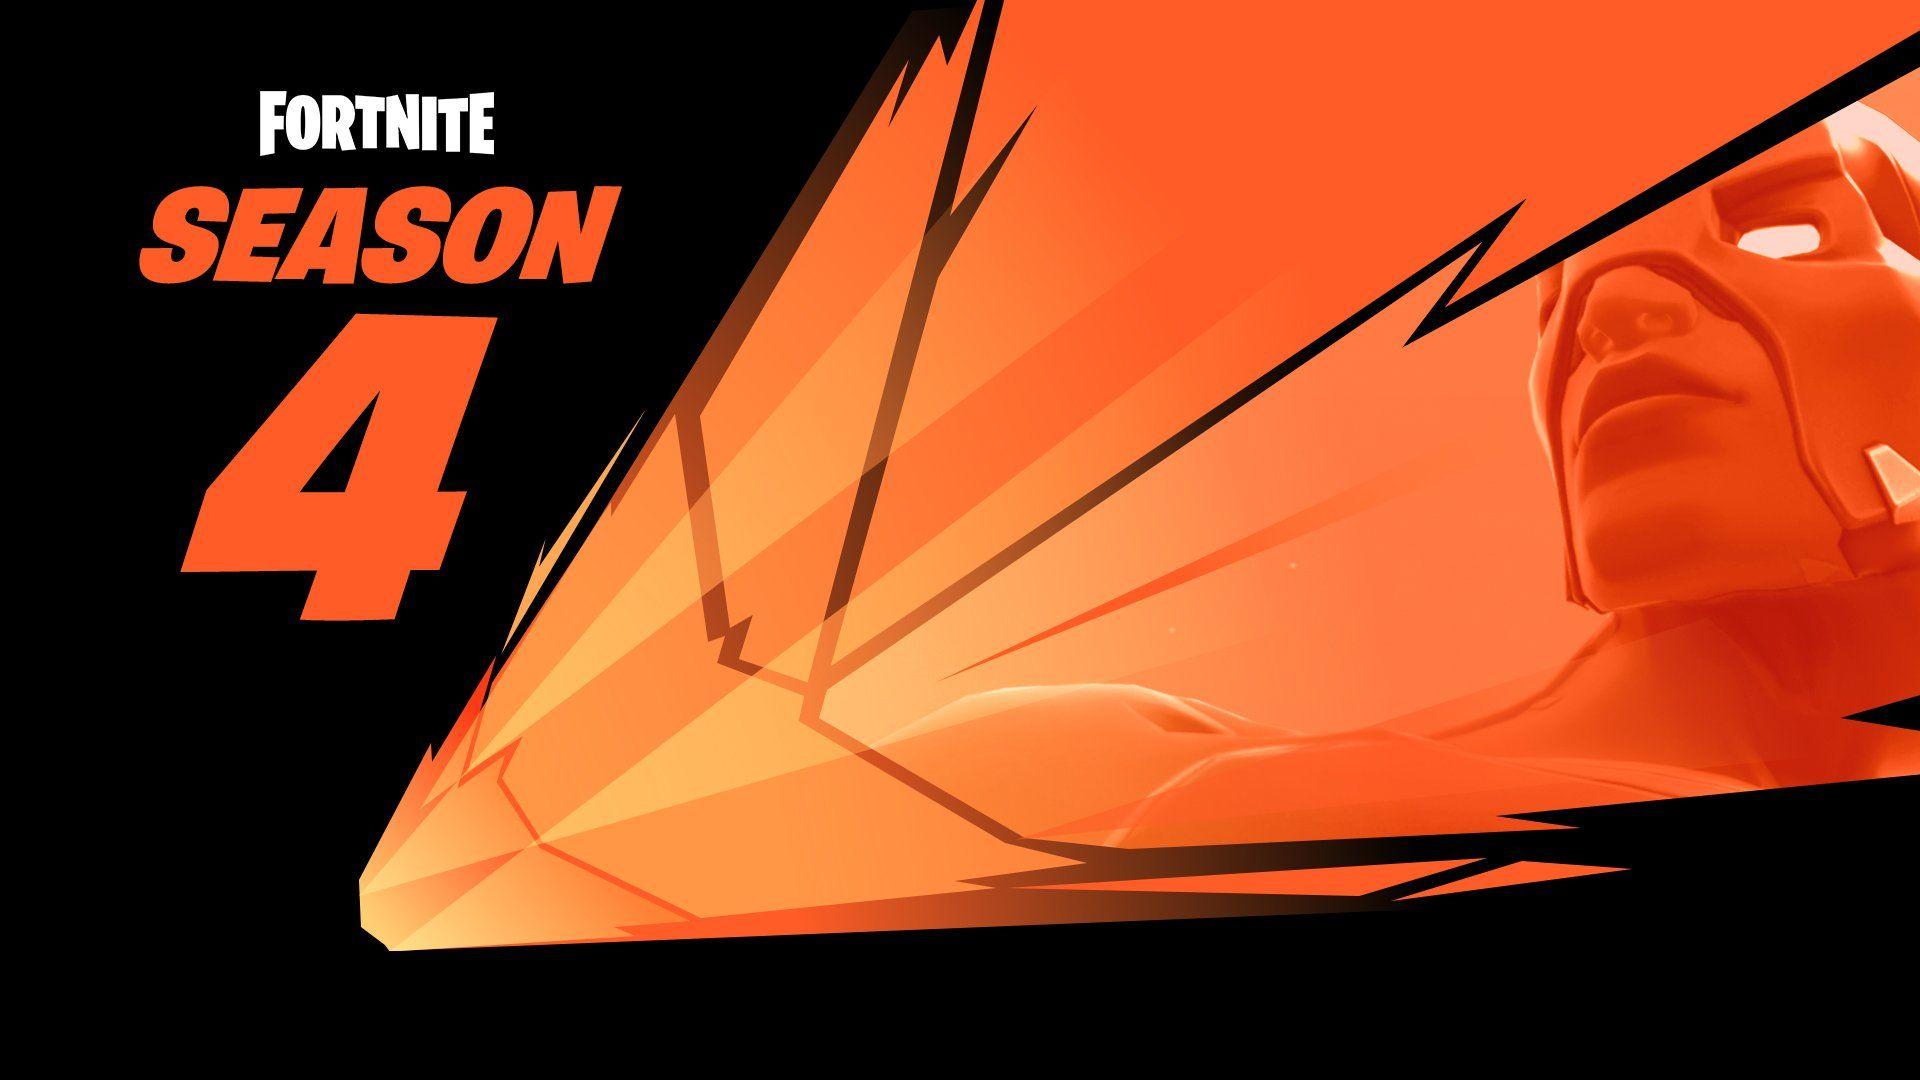 u2018fortnite u2019 season 4 teaser suggests possible superhero theme